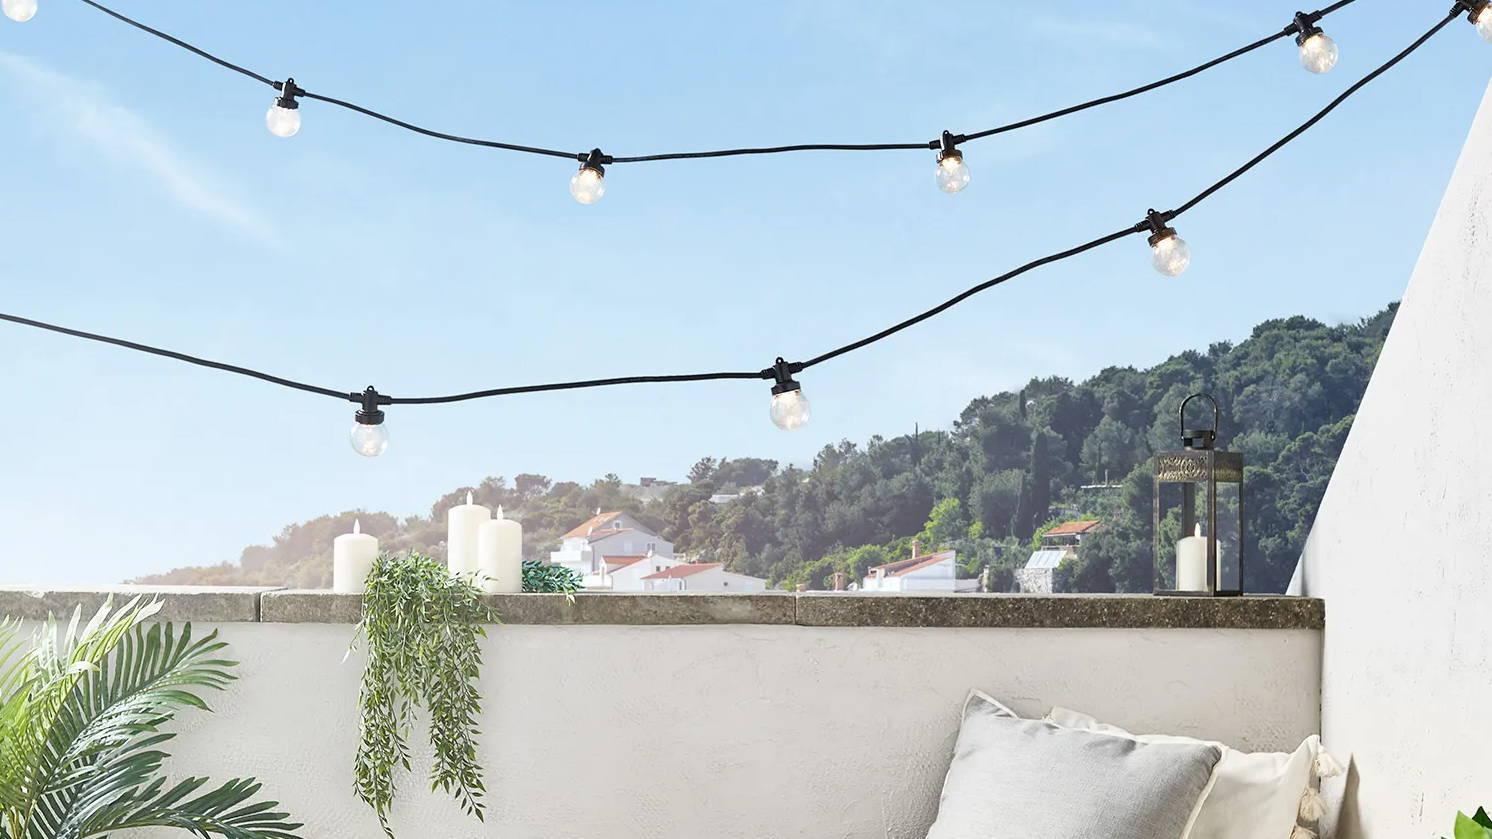 Warm white festoons hung above balcony